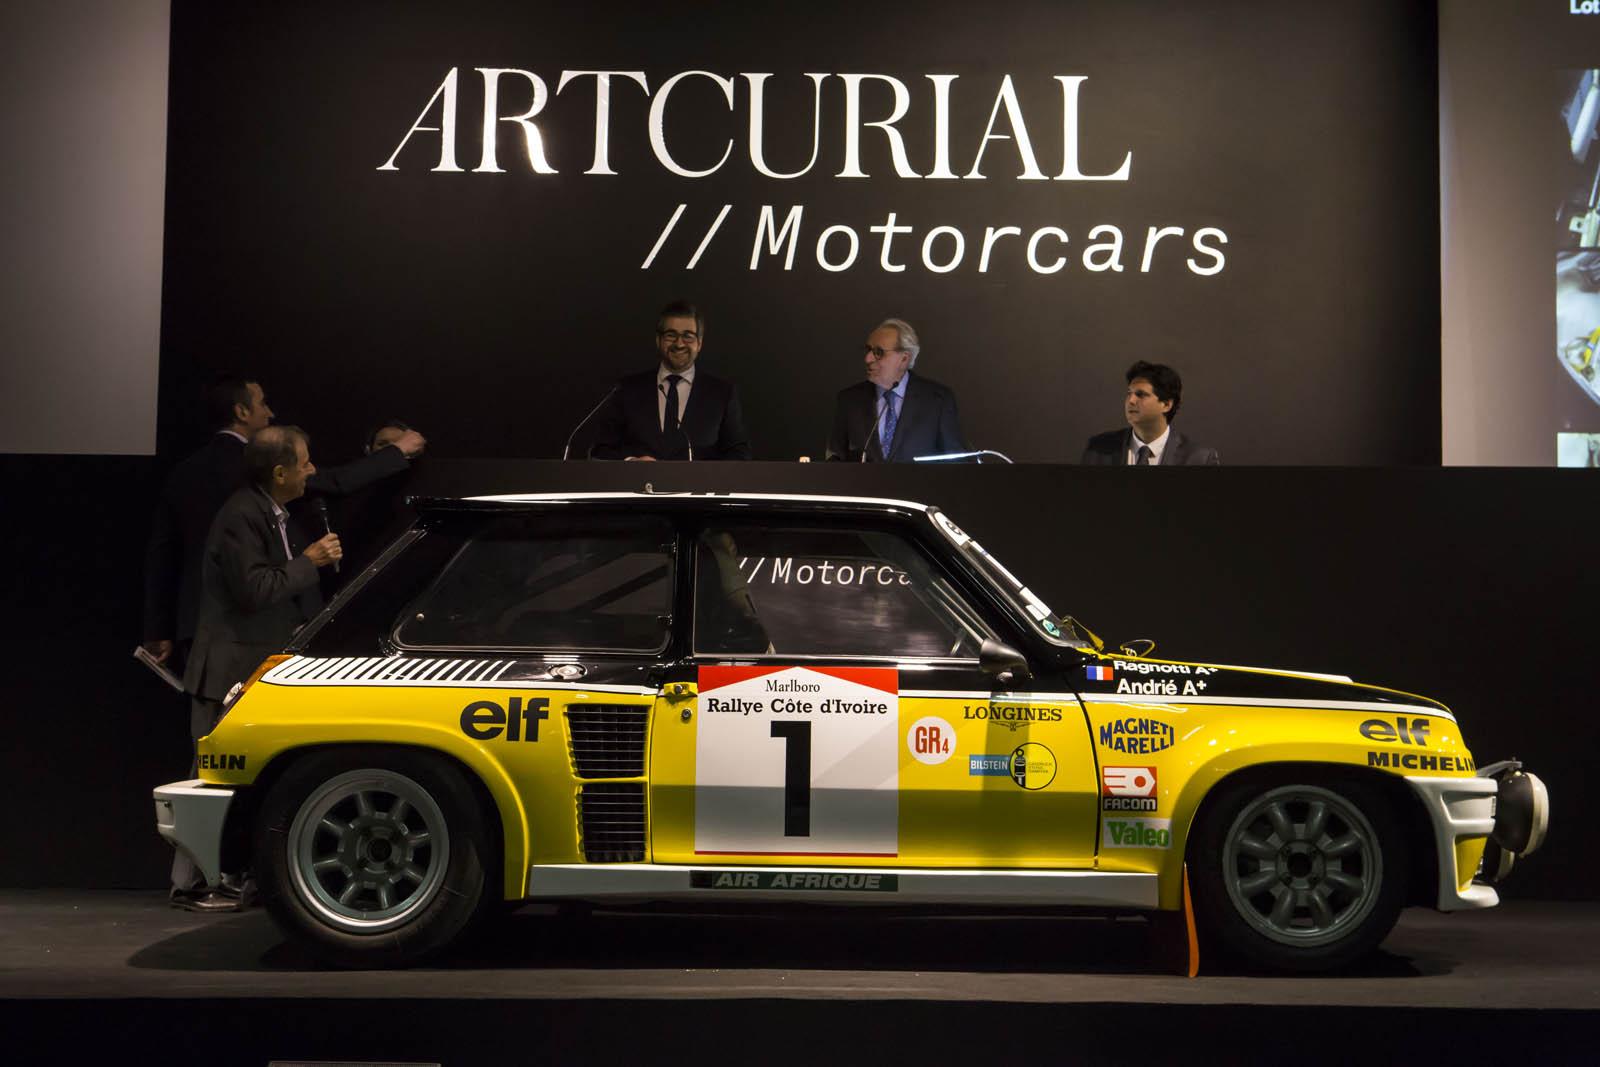 Lot+95+1982+Renault+5+Turbo+Groupe+4+%C2%A9Artcurial+copy